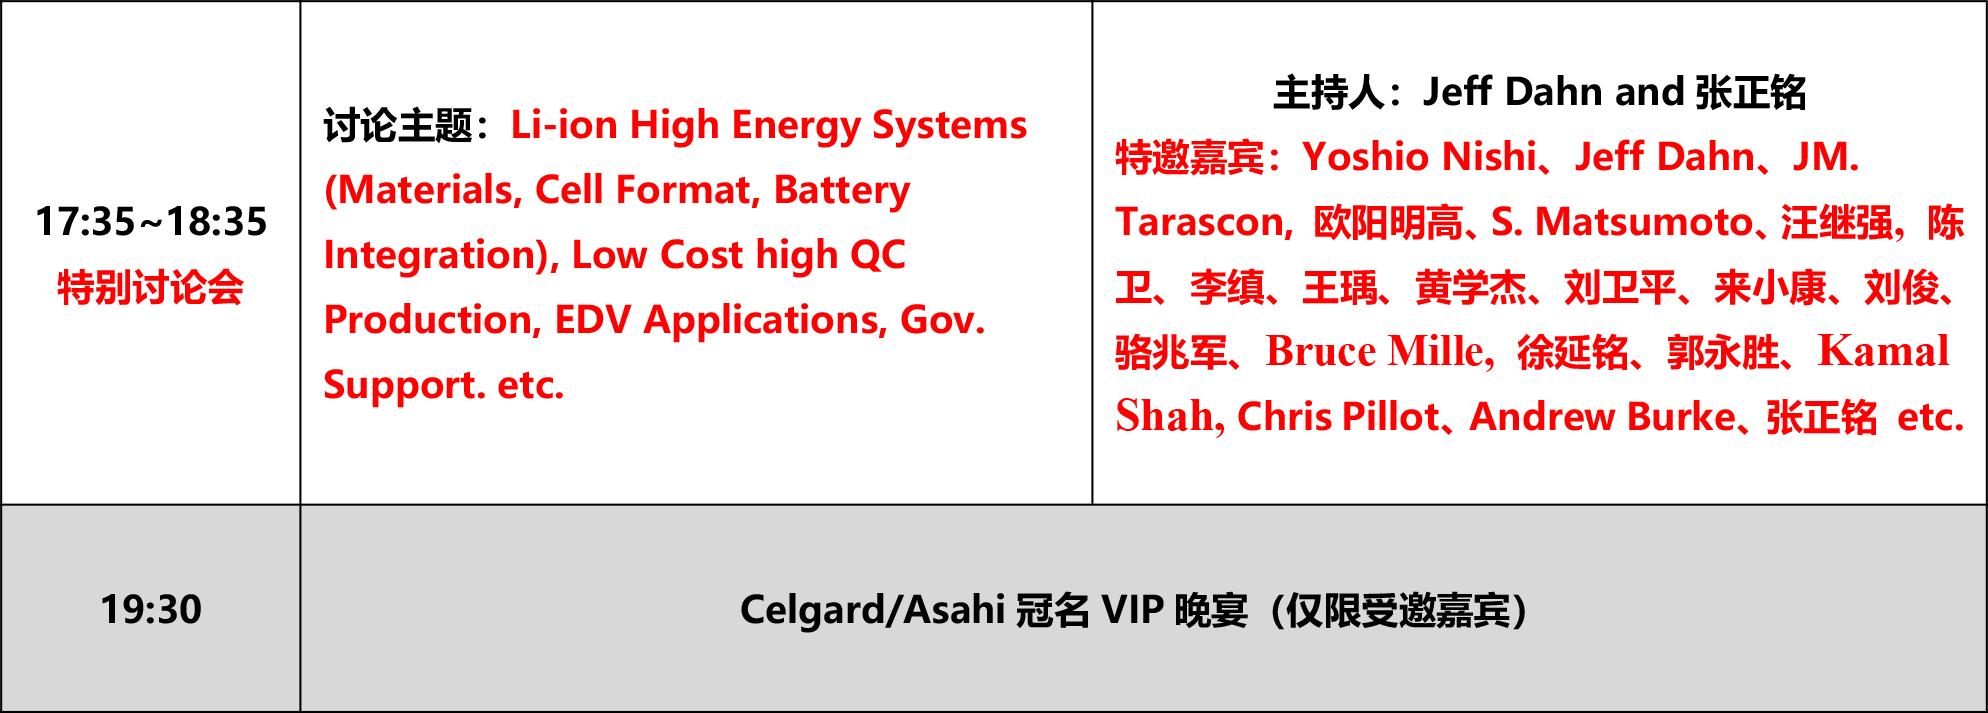 LBIS2019会议邀请函中文201900305整合(1)-4-1.jpg